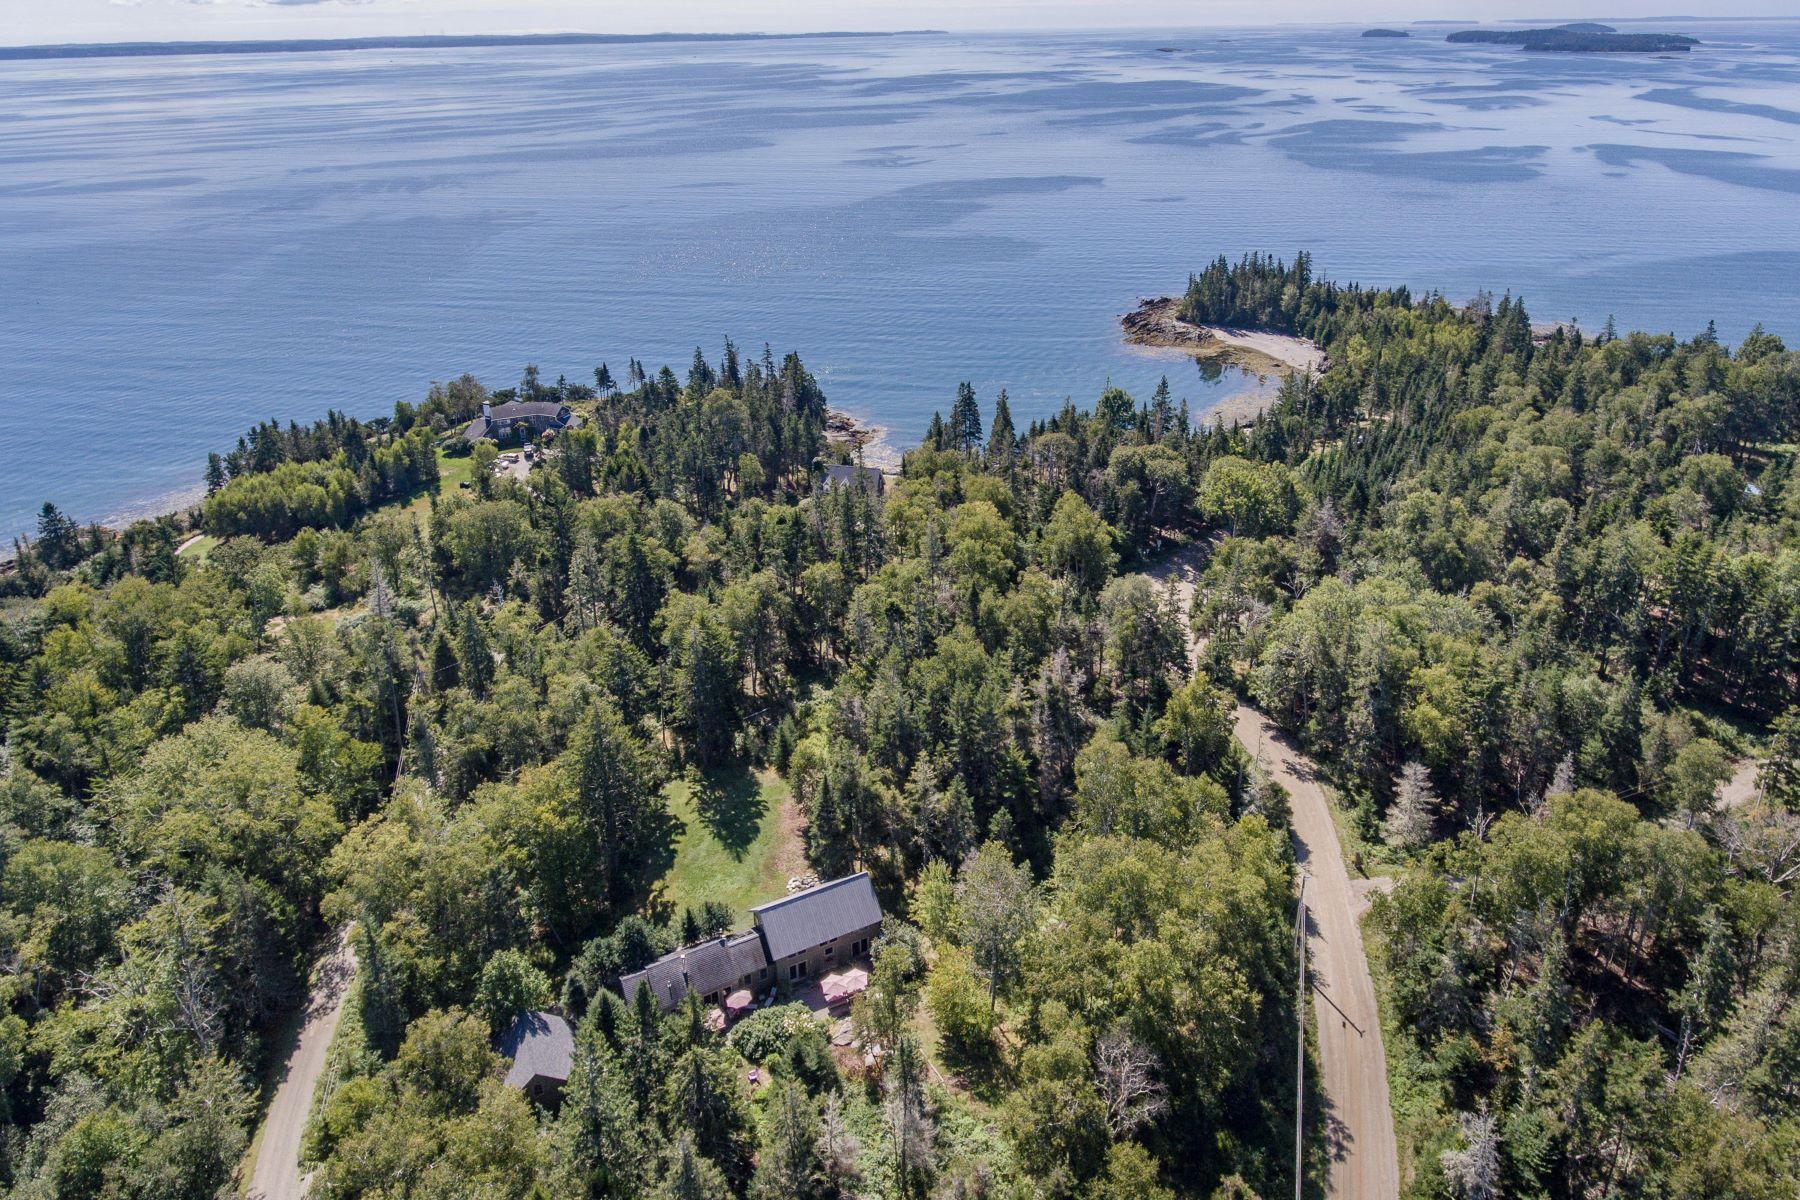 Single Family Homes for Active at 147 Jenny's Lane Islesboro, Maine 04848 United States